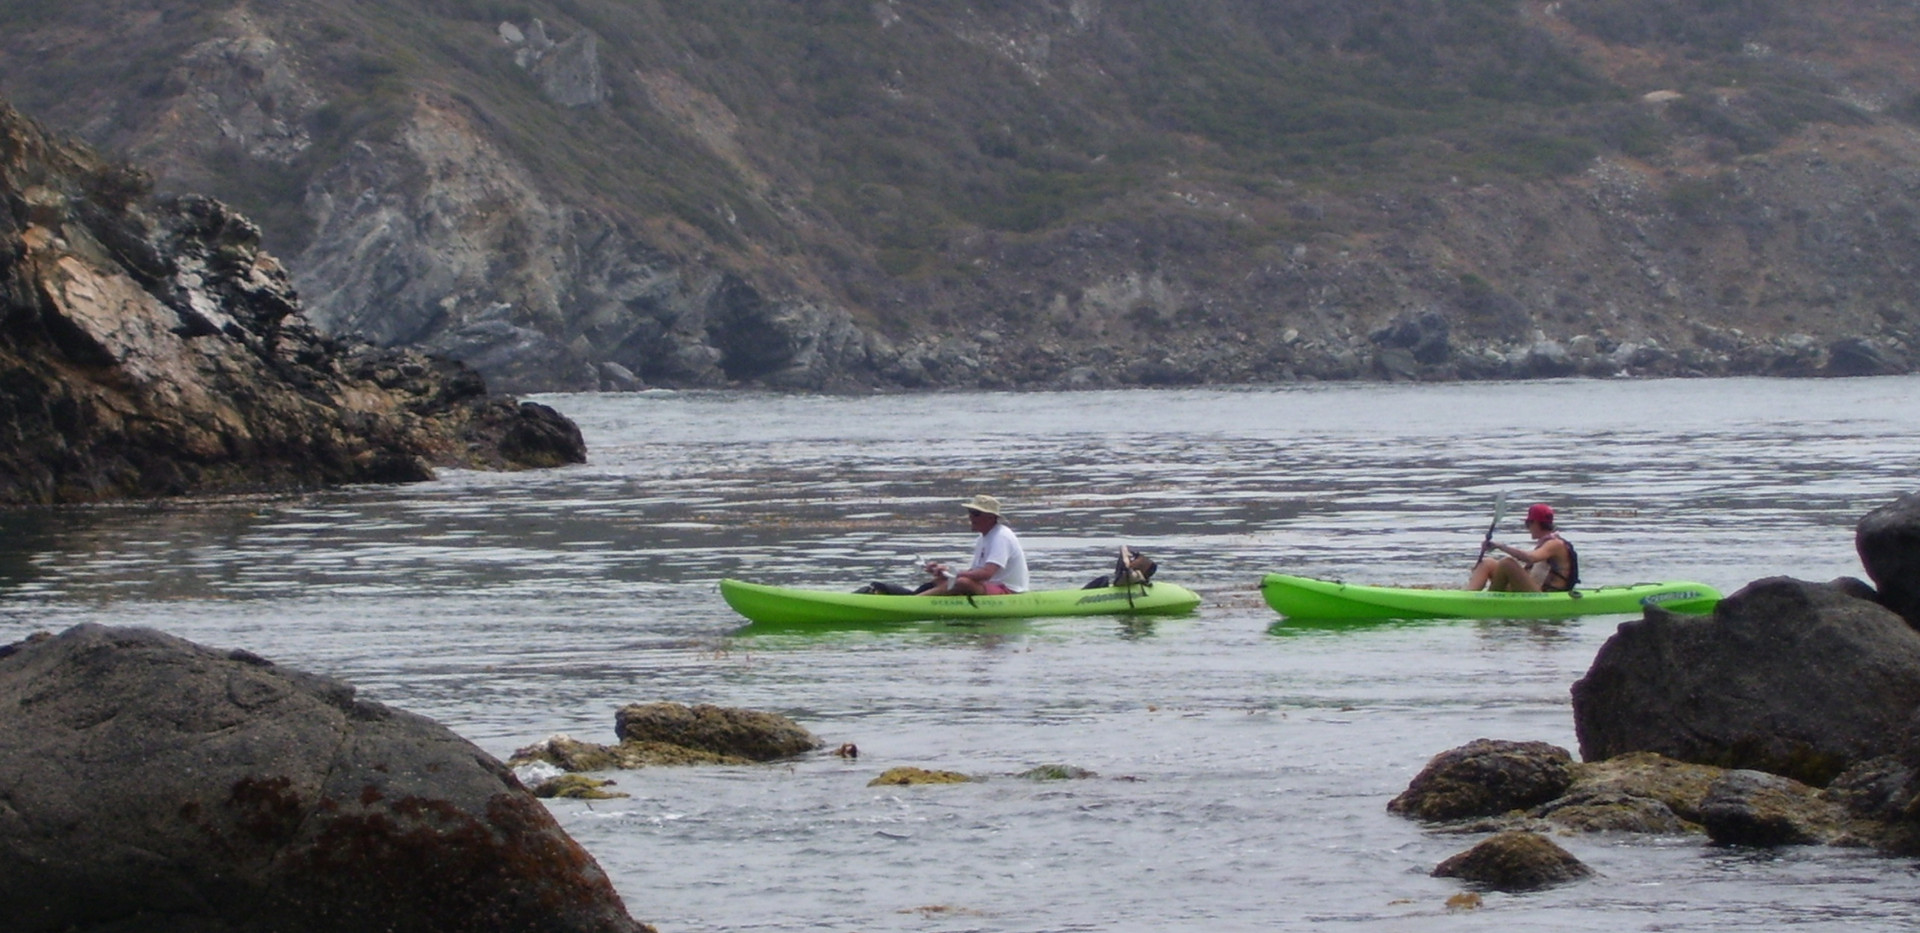 Kayaking on Catalina Island